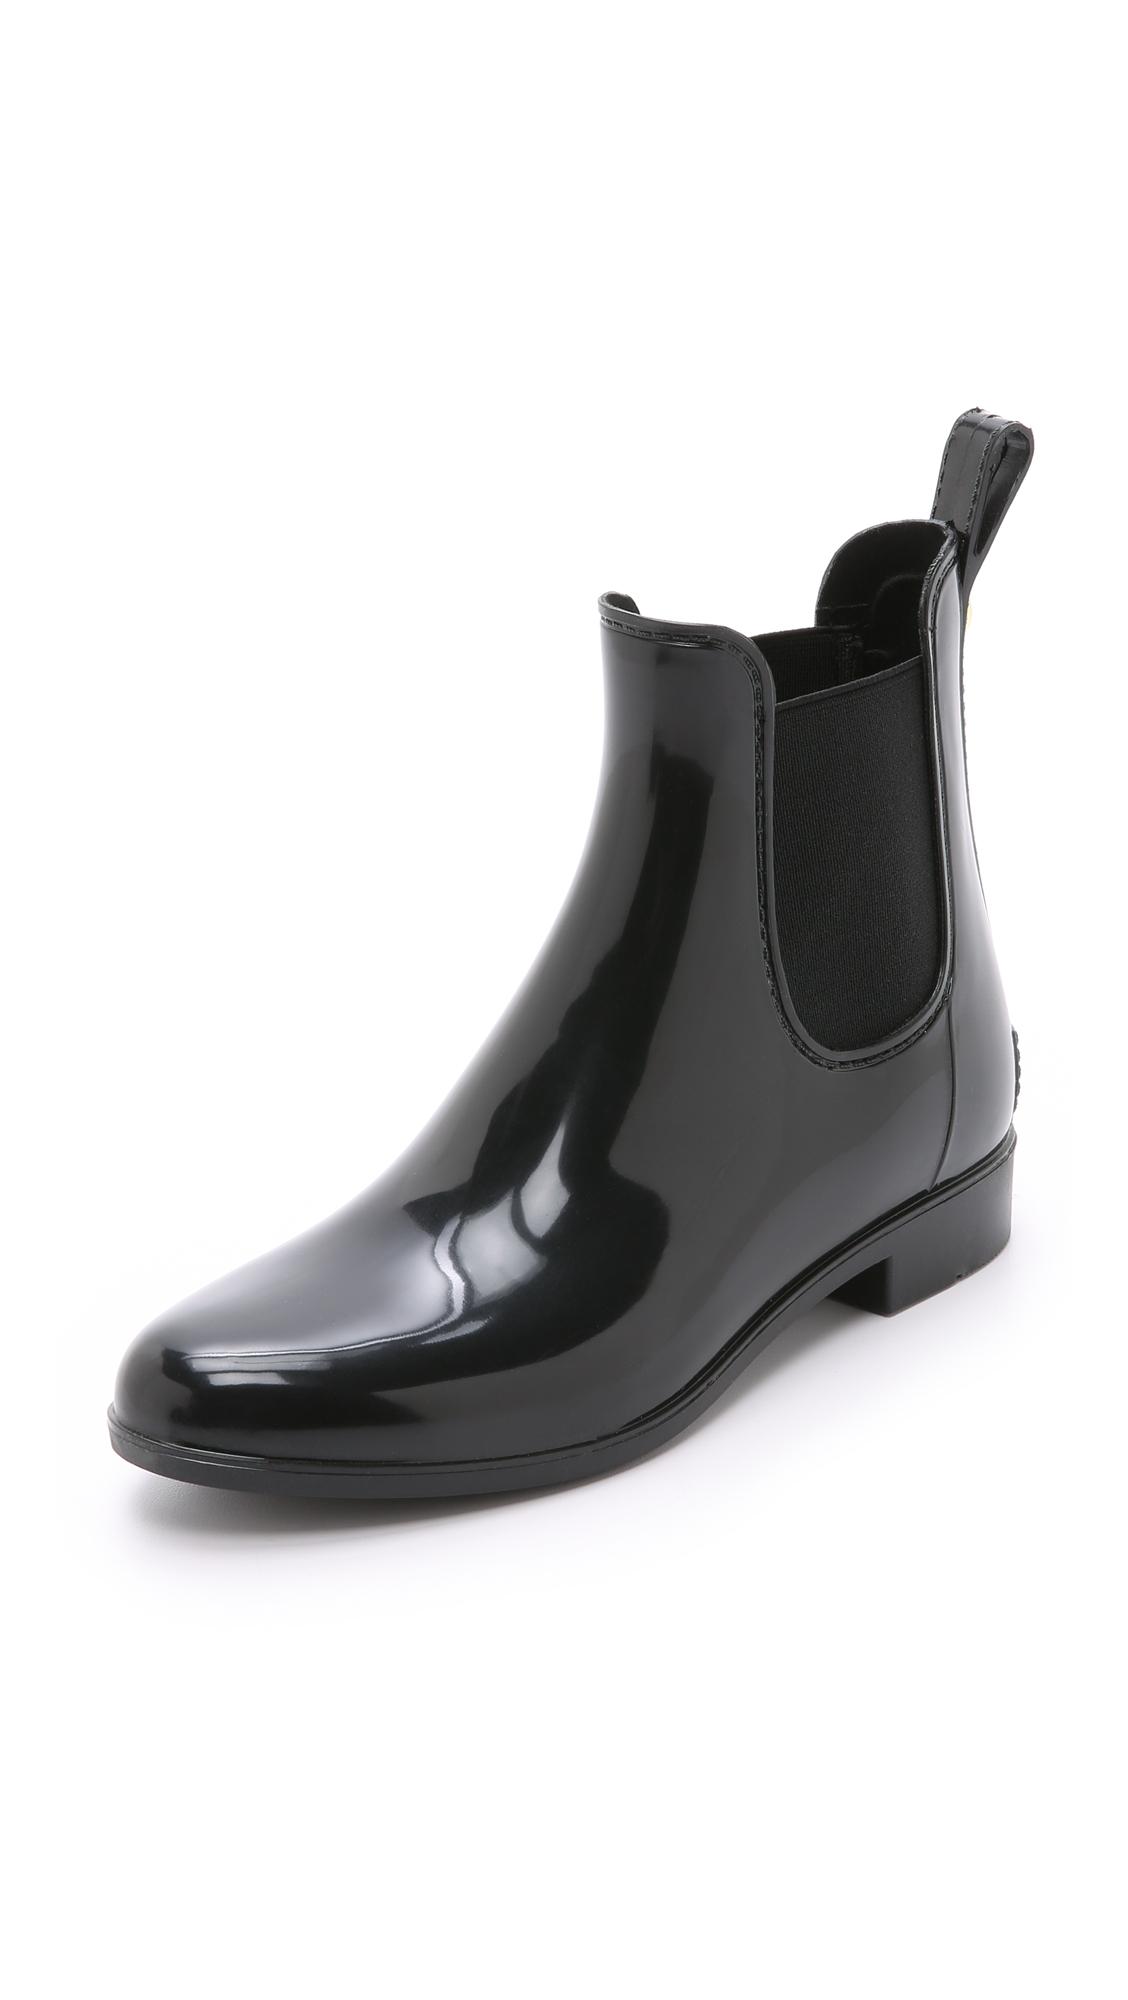 Sam Edelman Tinsley Gloss Chelsea Rain Booties In Black;Sangria/Black;Space Blue/Black